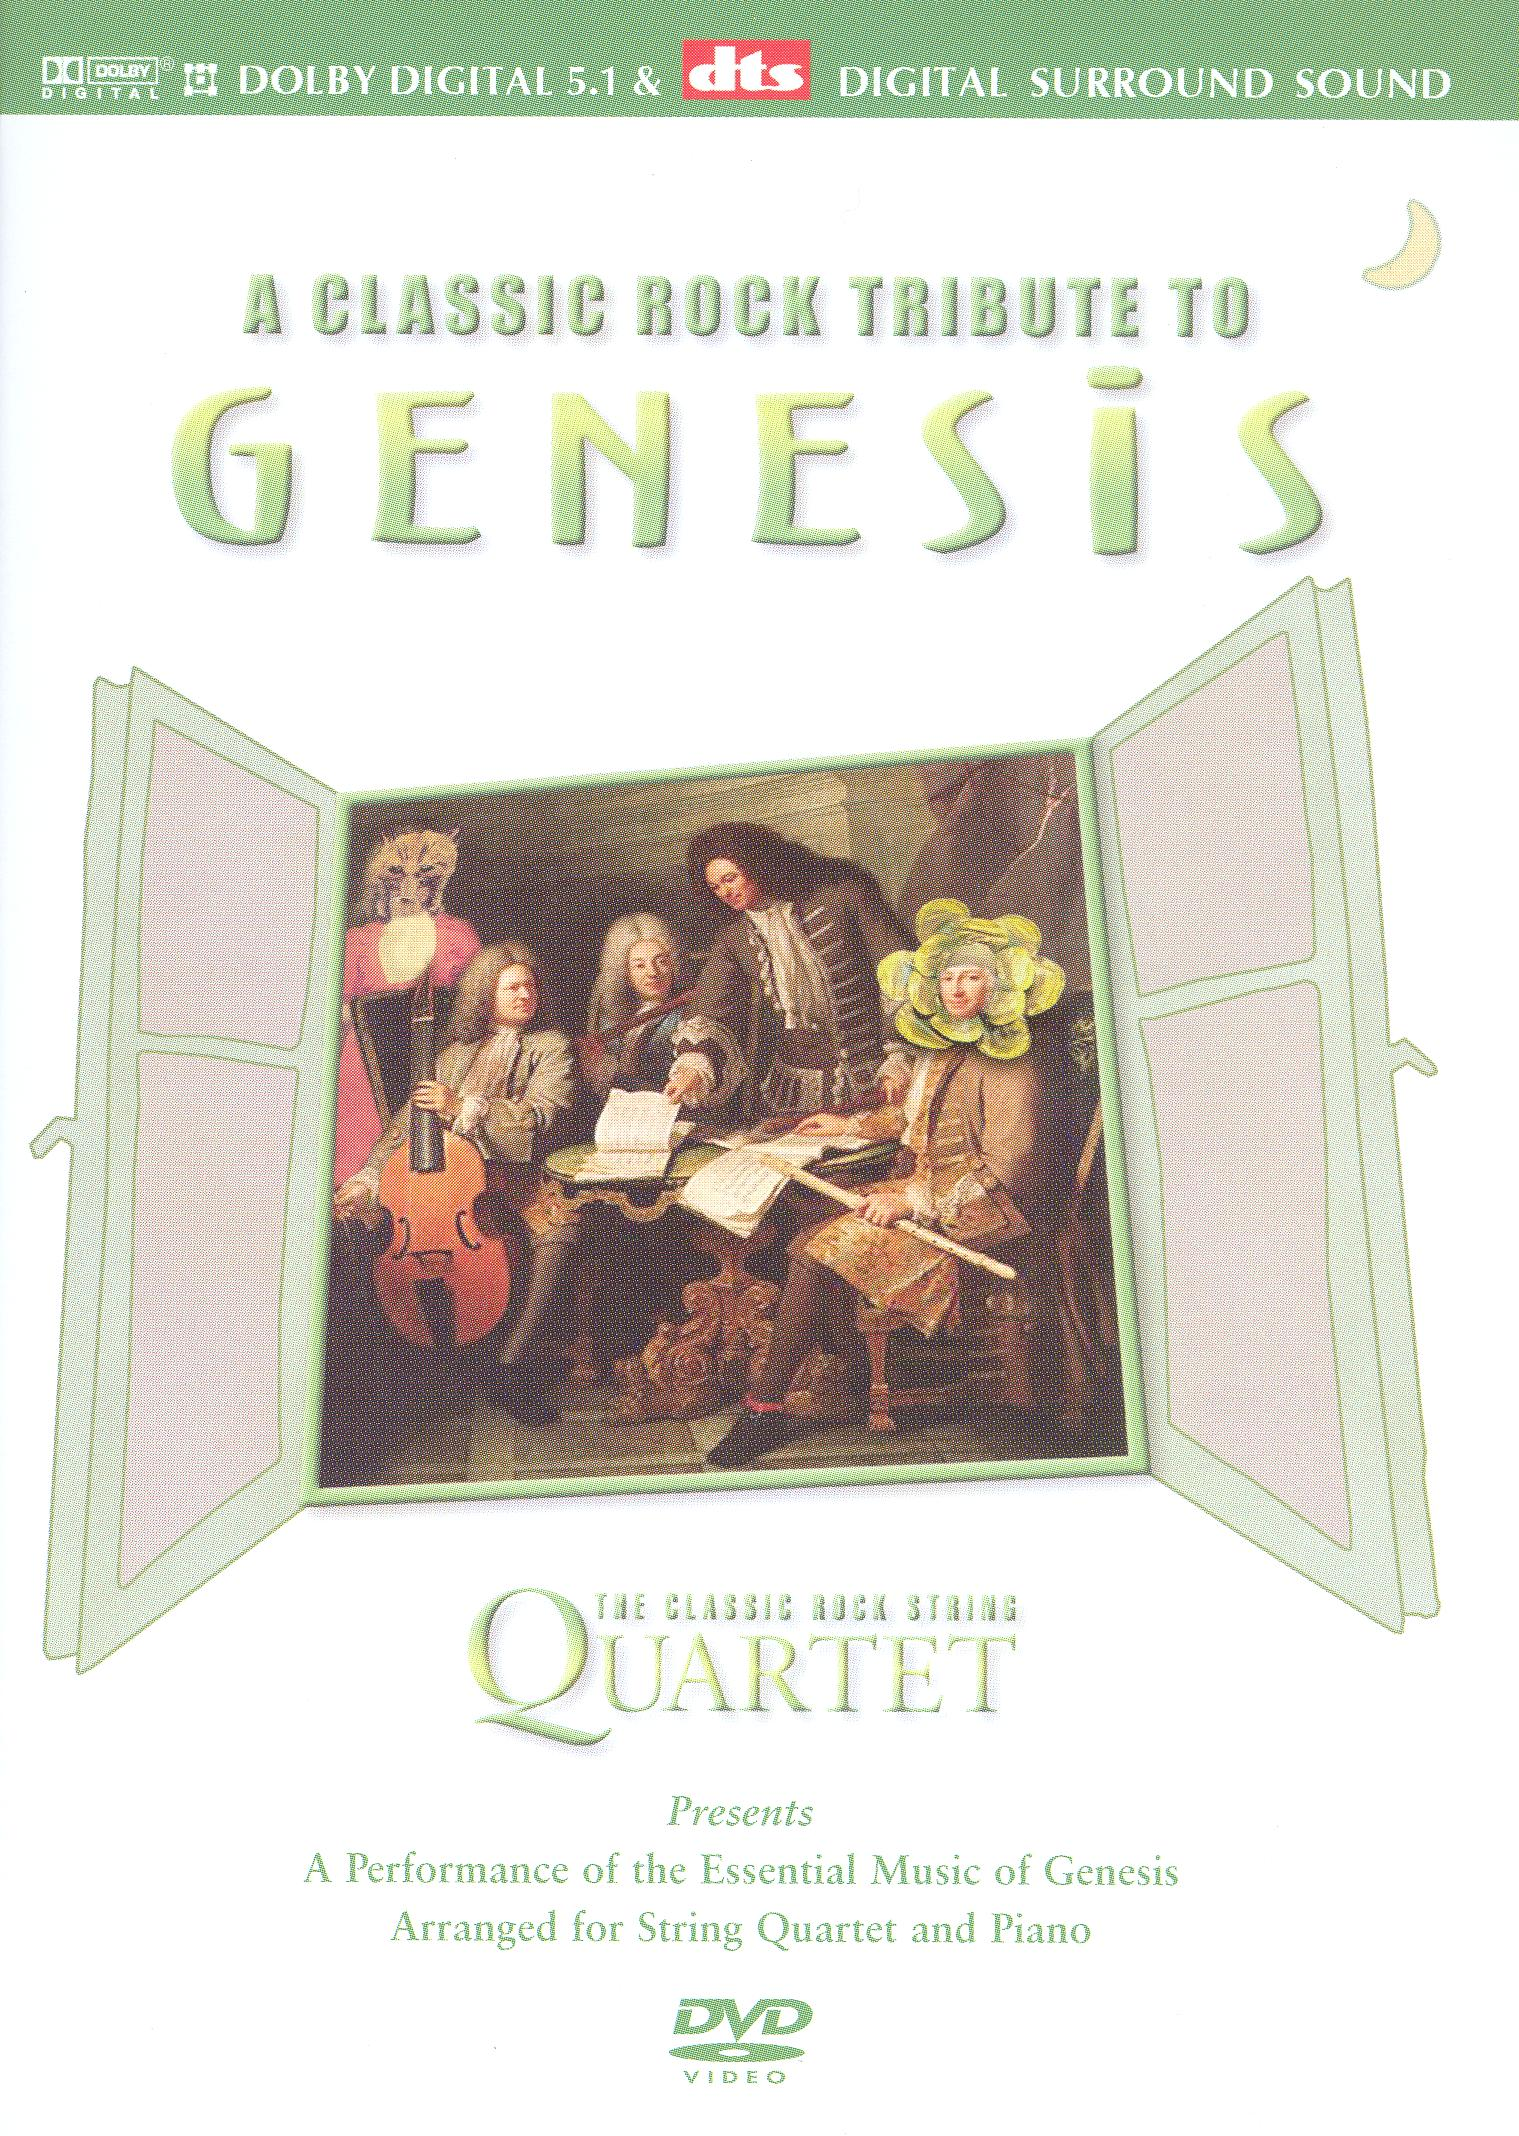 Classic Rock String Quartet: Tribute to Genesis